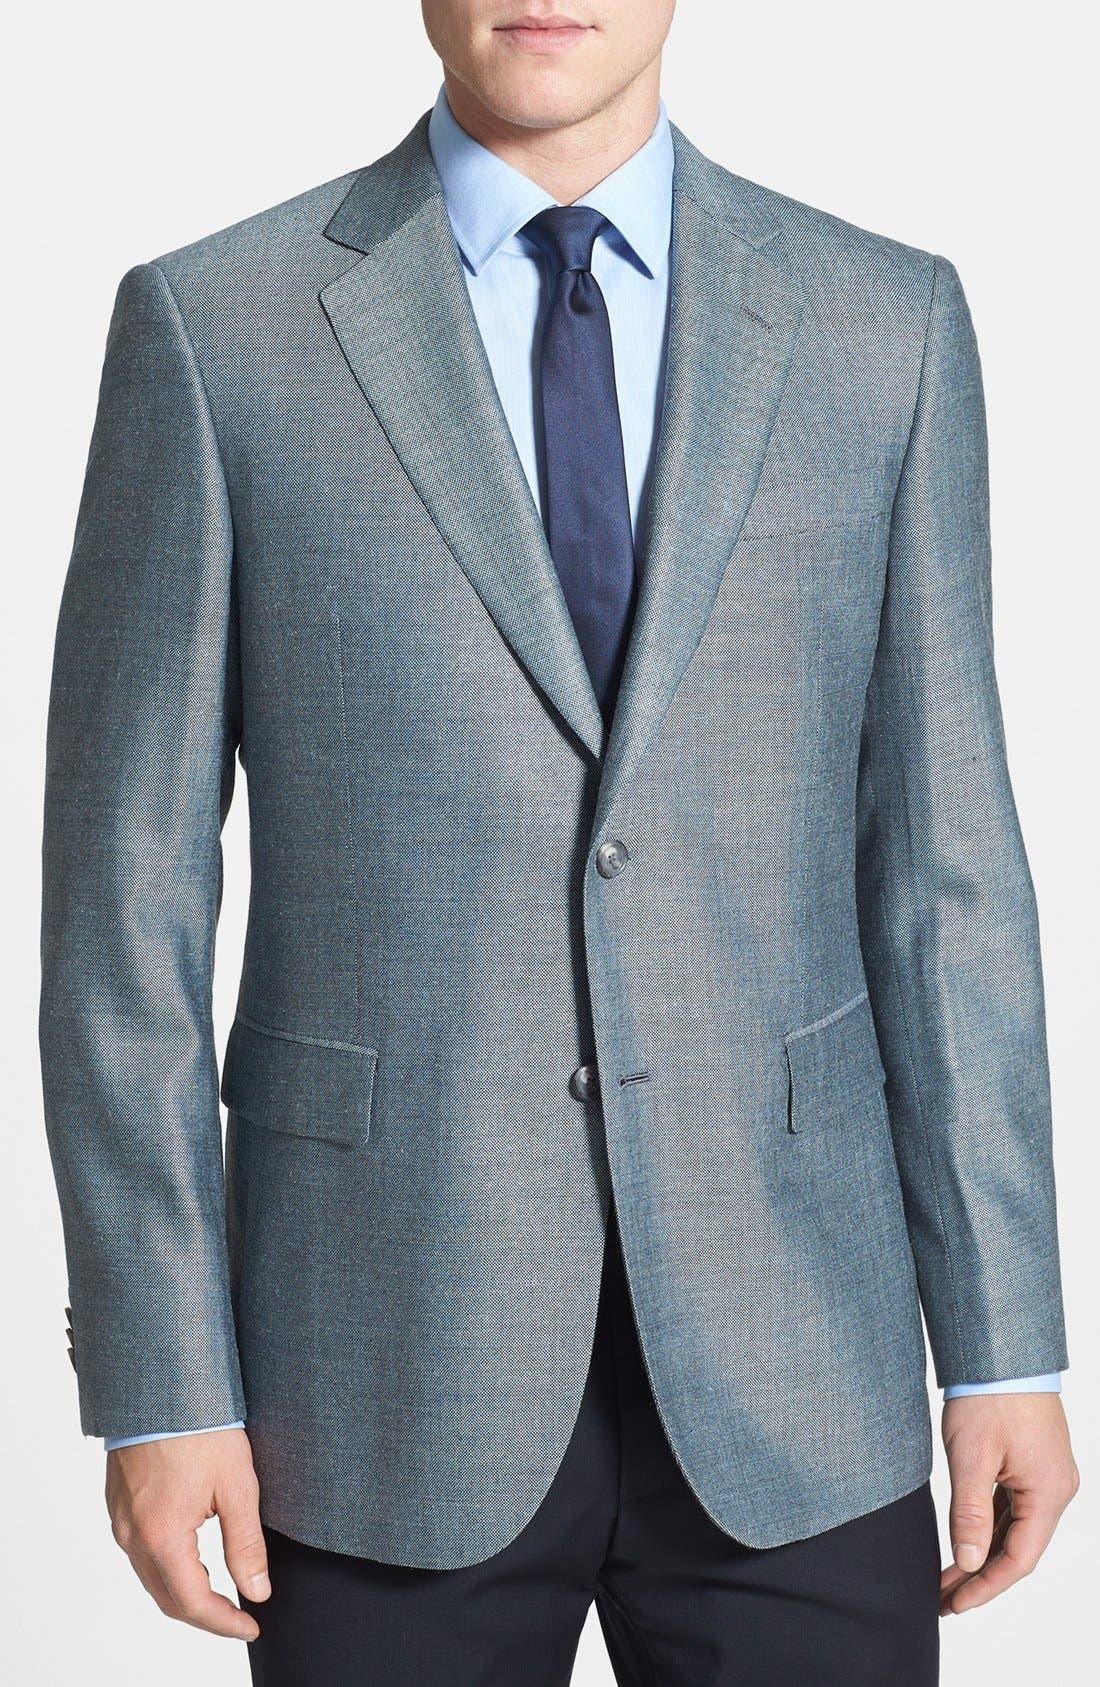 Alternate Image 1 Selected - John W. Nordstrom® Classic Fit Silk Blend Sportcoat